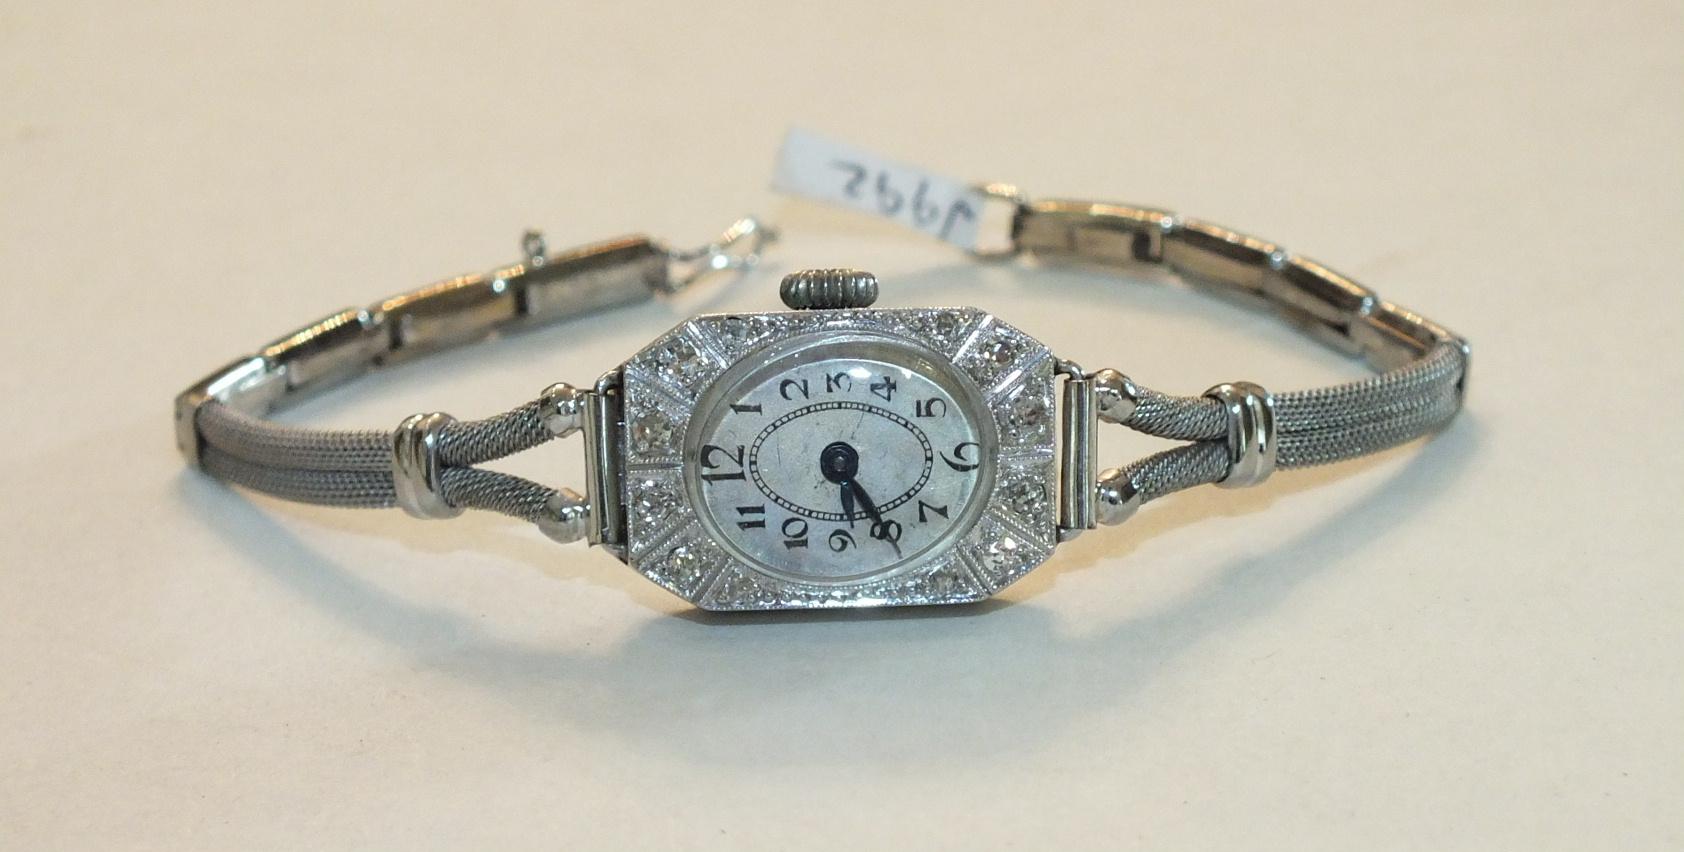 Lot 232 - A ladies Art Deco cocktail watch, the octagonal platinum case with 8/8-cut diamond-set bezel, on 9ct